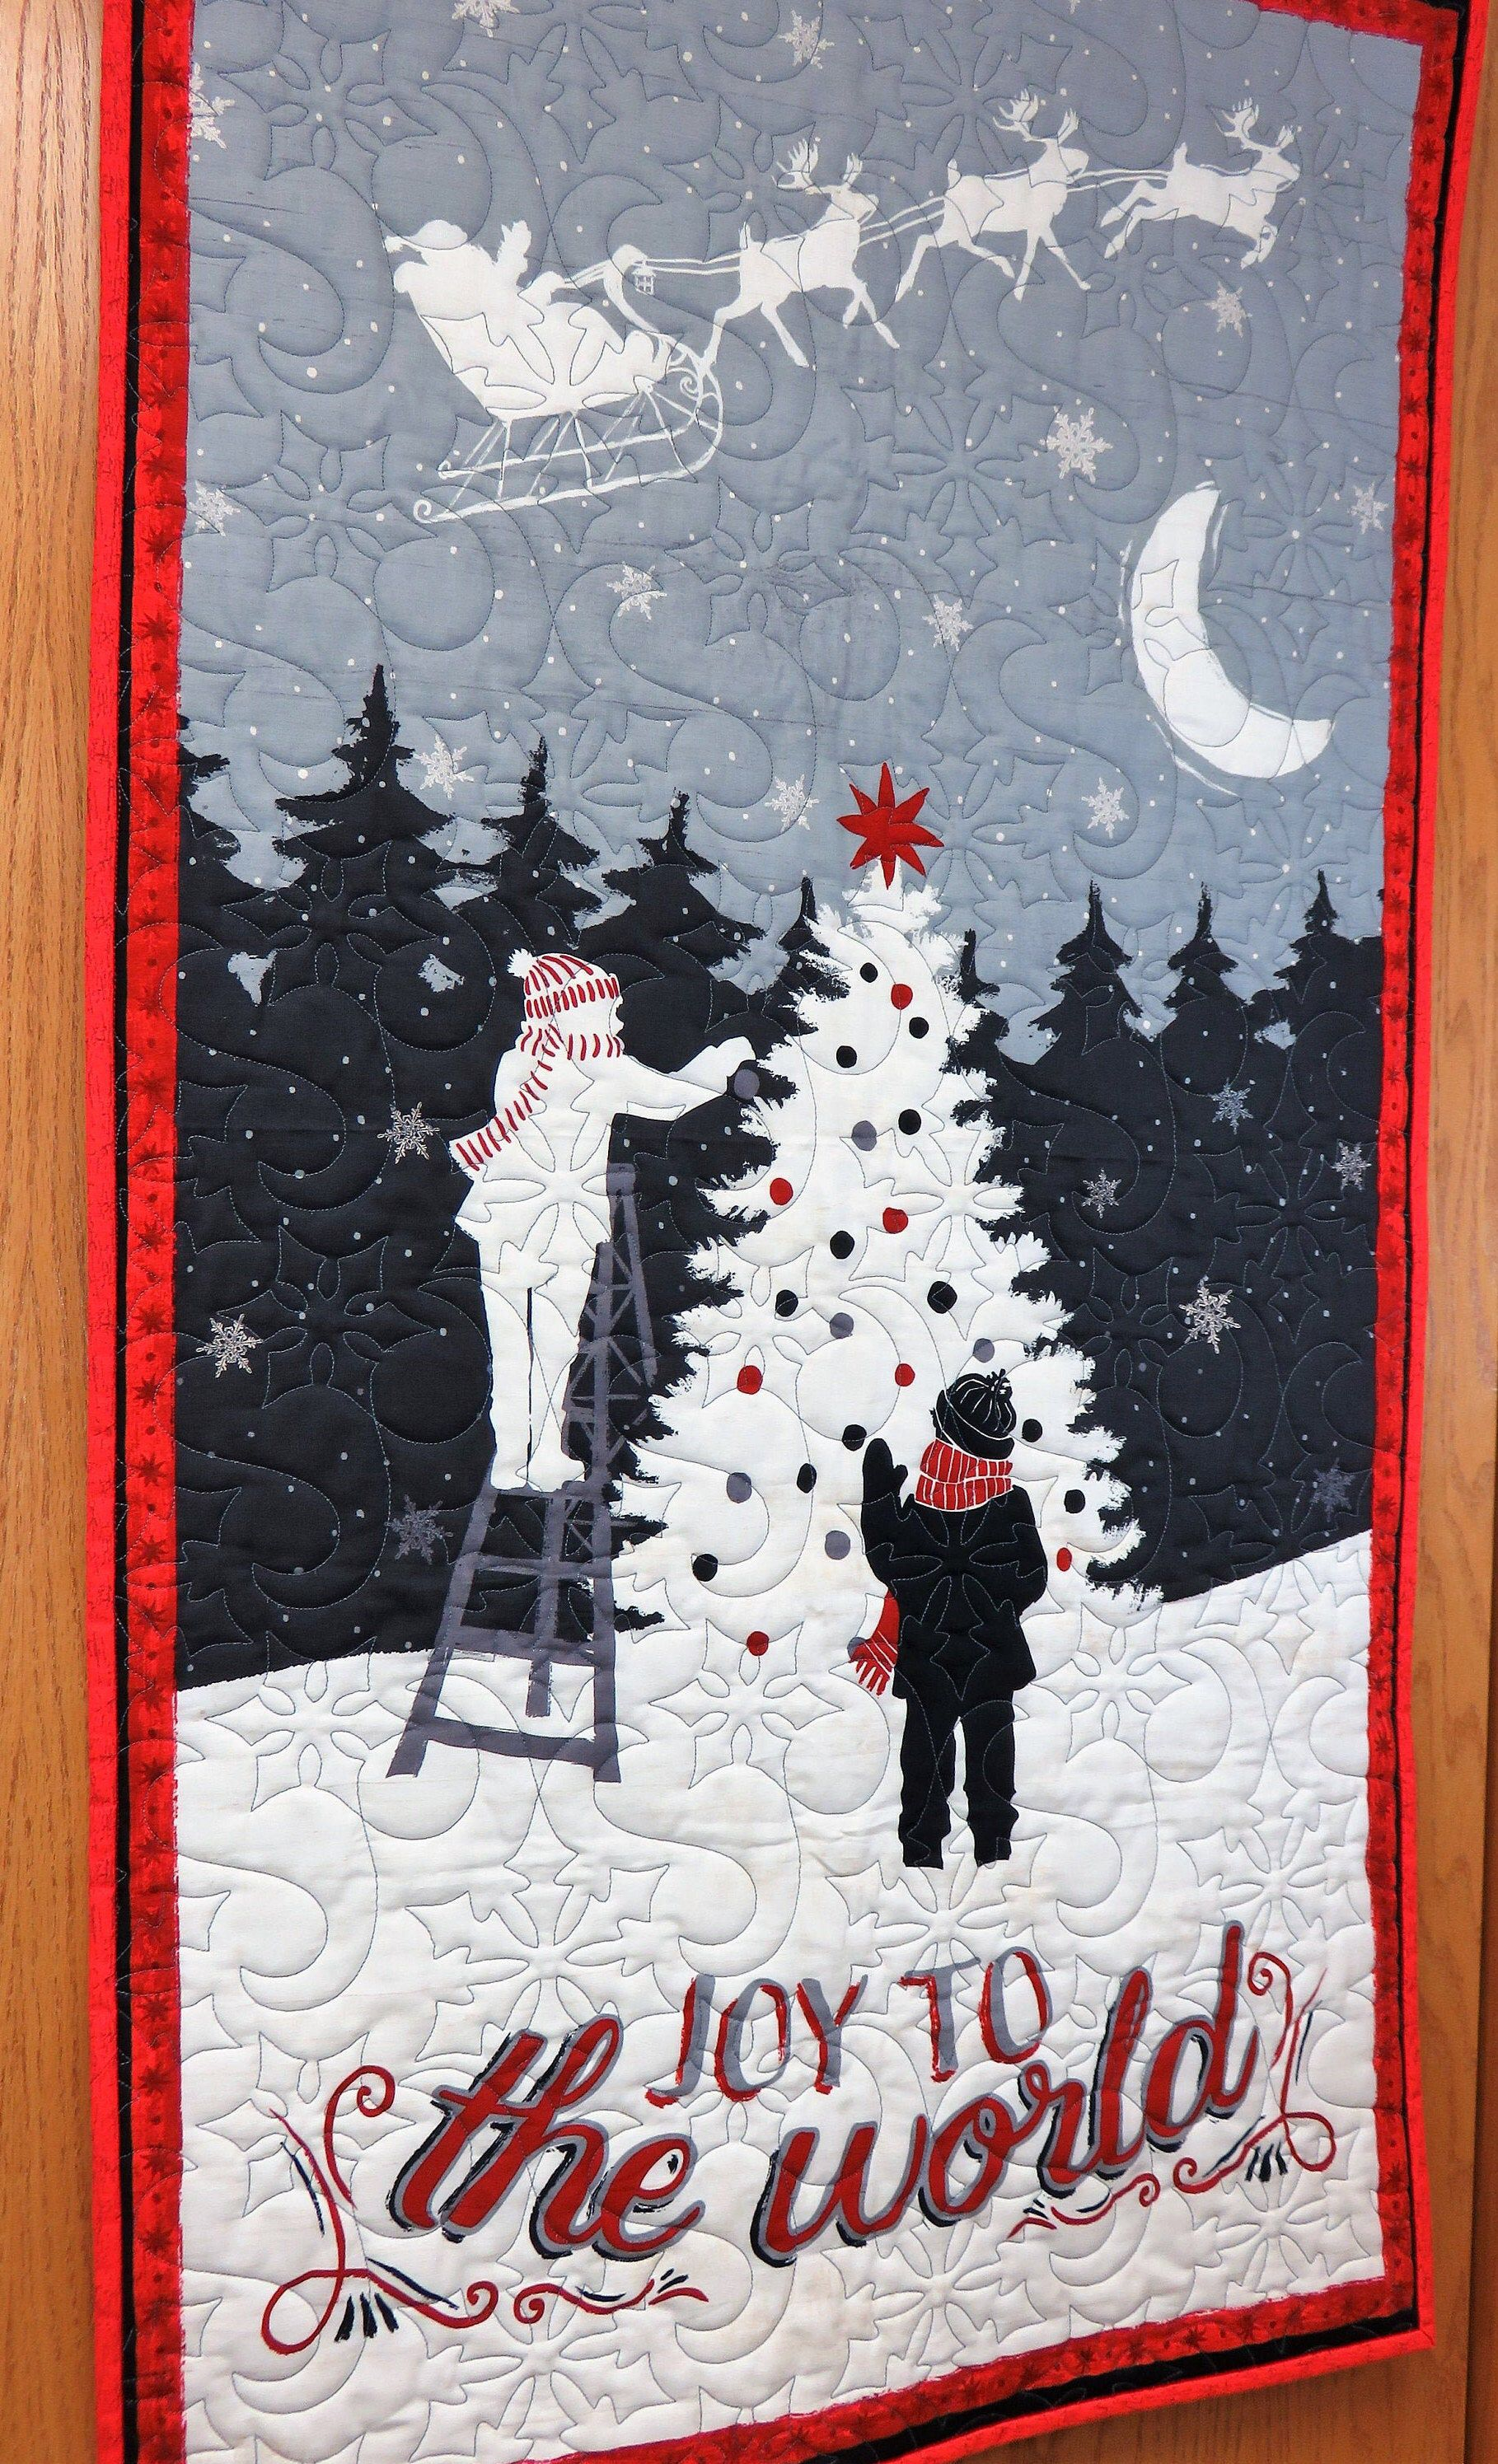 Handmade Christmas Wall Hanging For Sale Winter Wall Hanging Etsy Christmas Wall Hangings Holiday Quilts Handmade Christmas